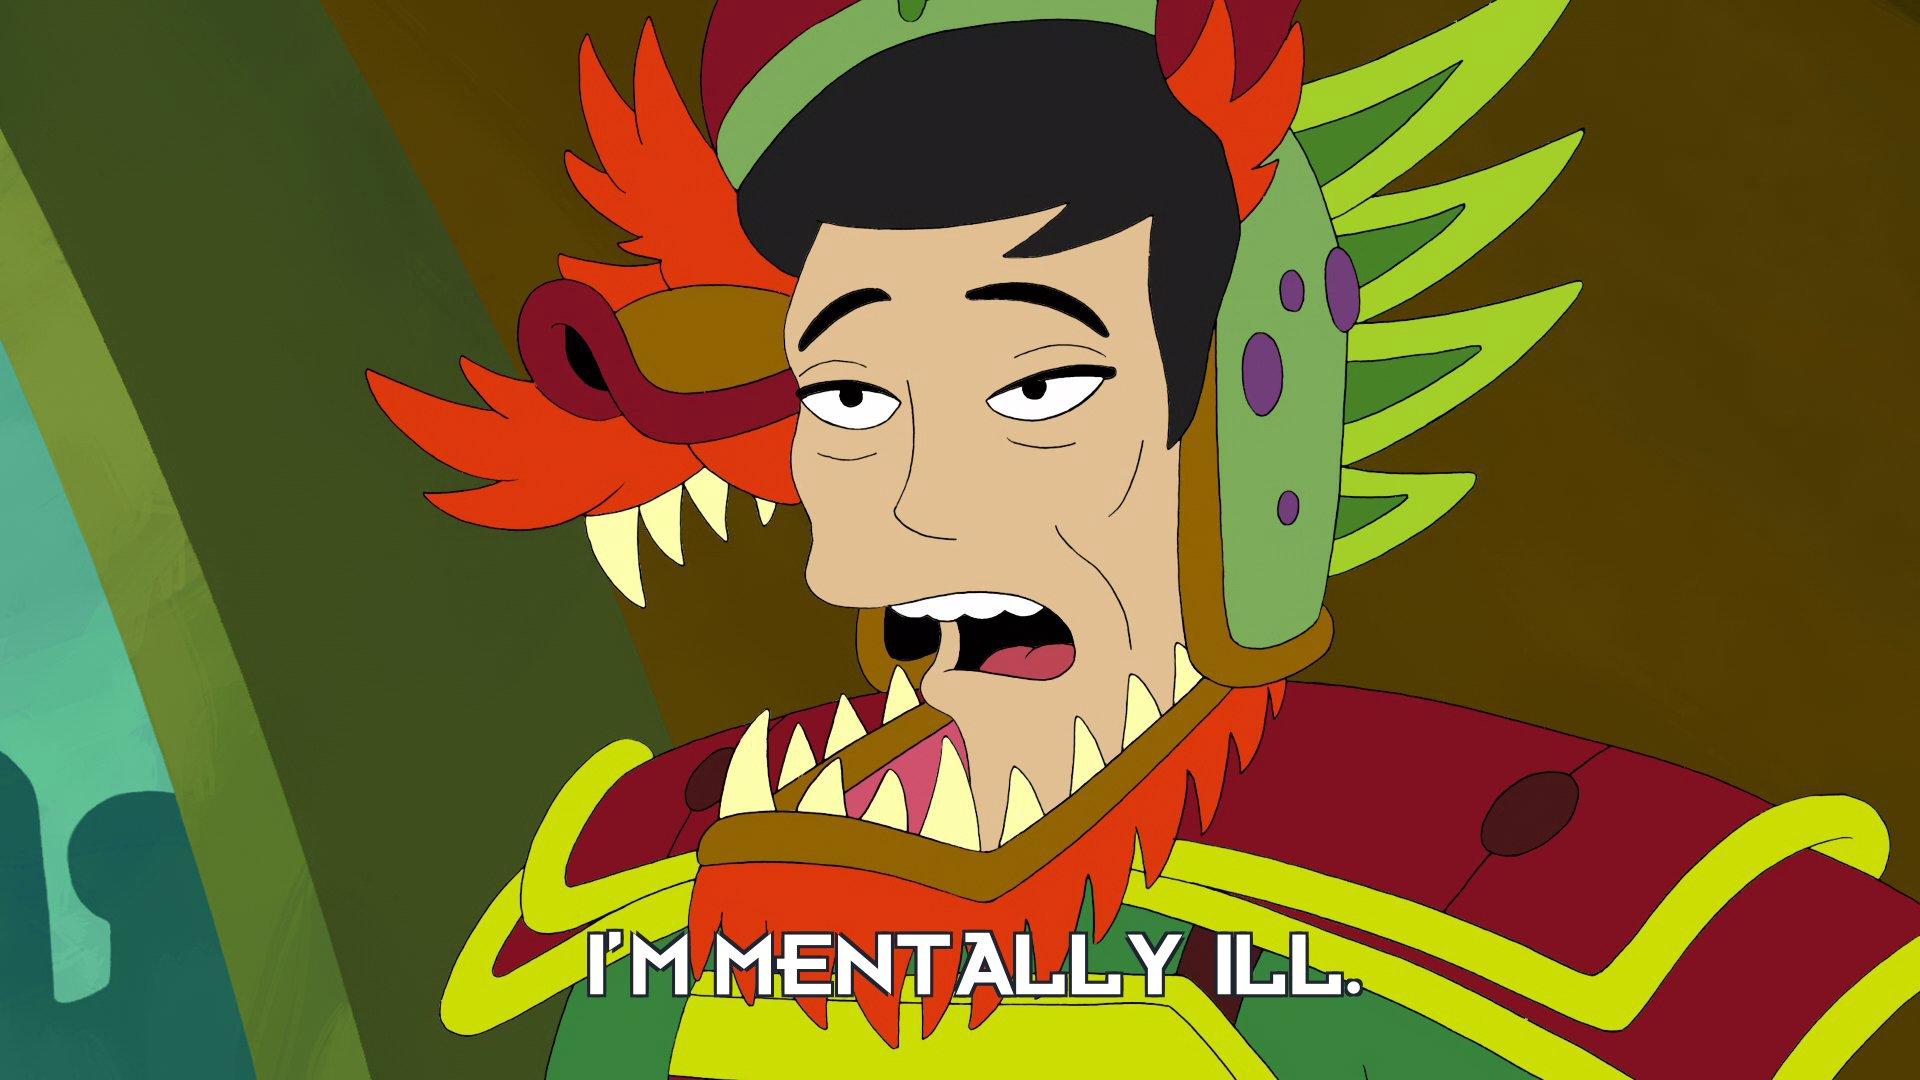 George Takei: I'm mentally ill.